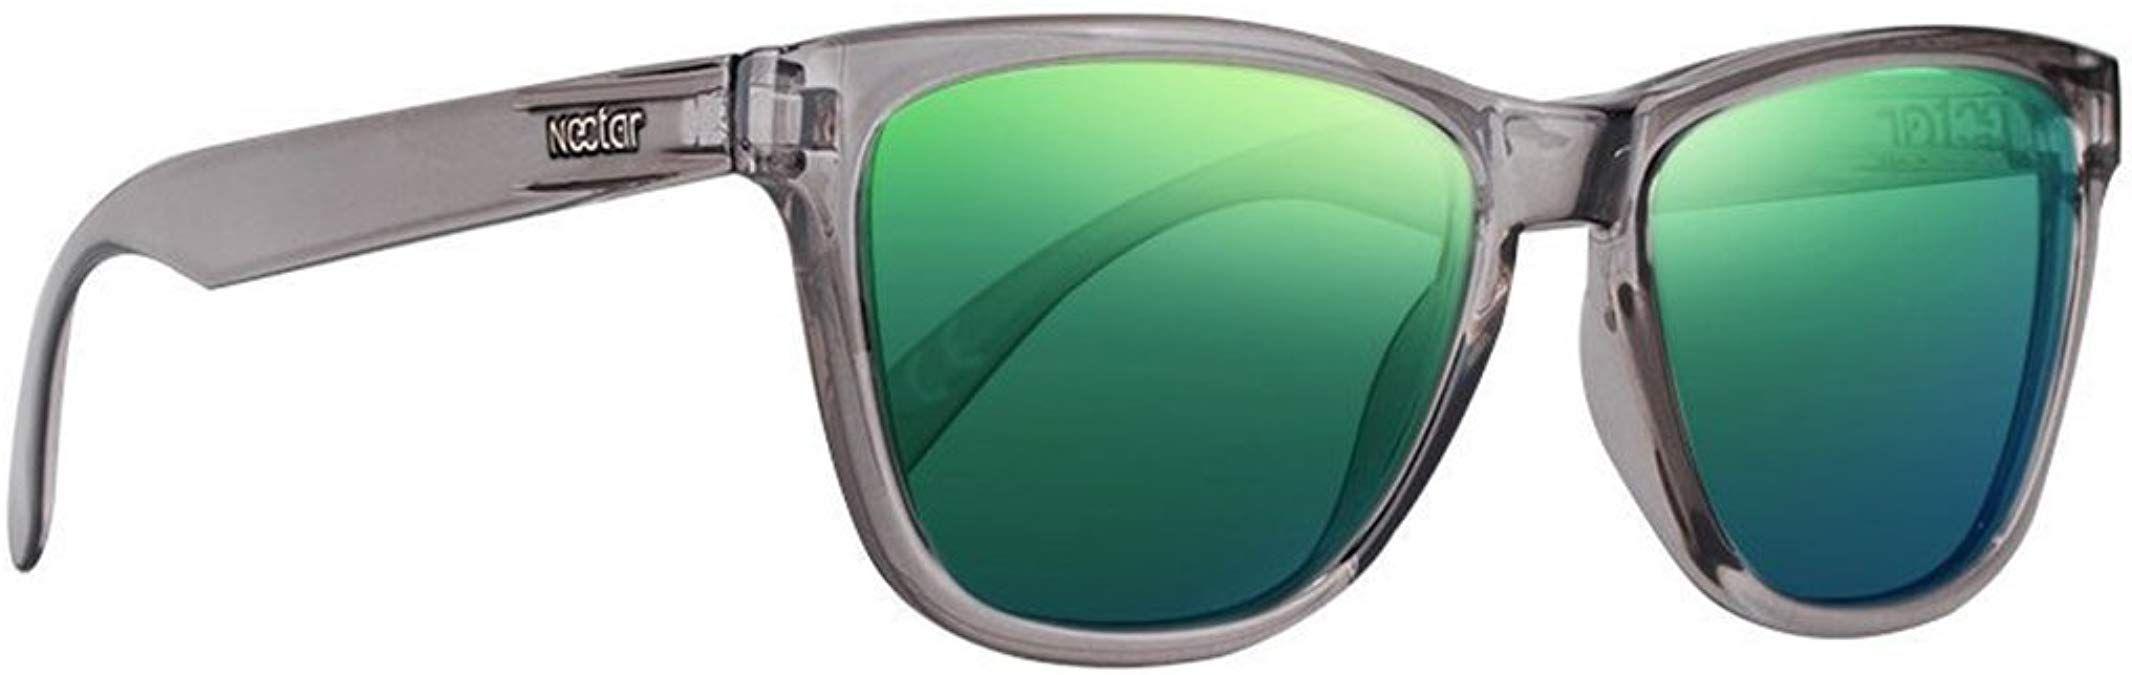 Tommy Hilfiger Th1657gs Shield Sunglasses Black /& Grey 99 mm